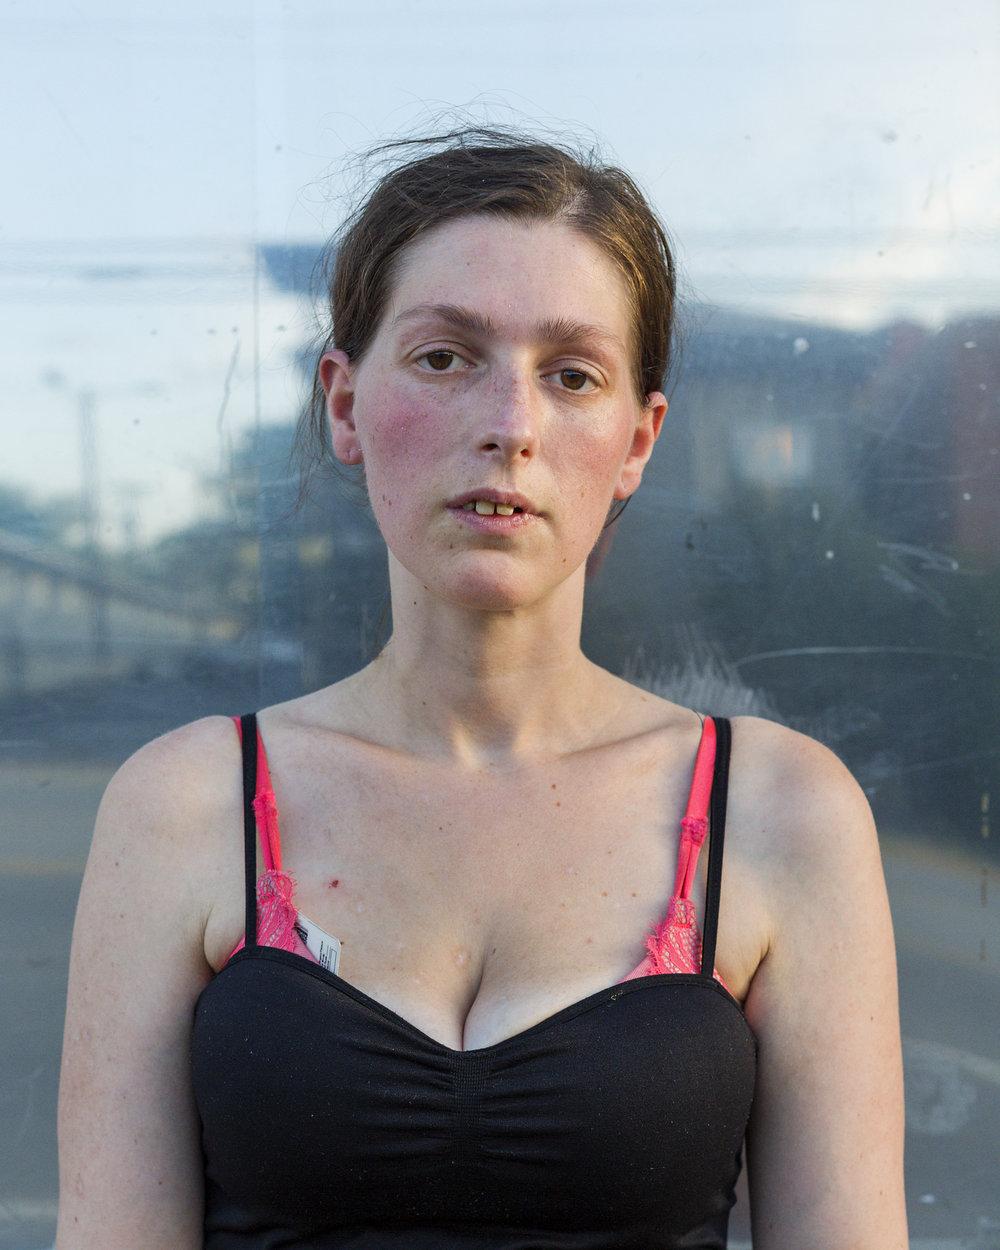 Tamara Reynolds   Nashville, Tennessee   tamarareynoldsphotography.com